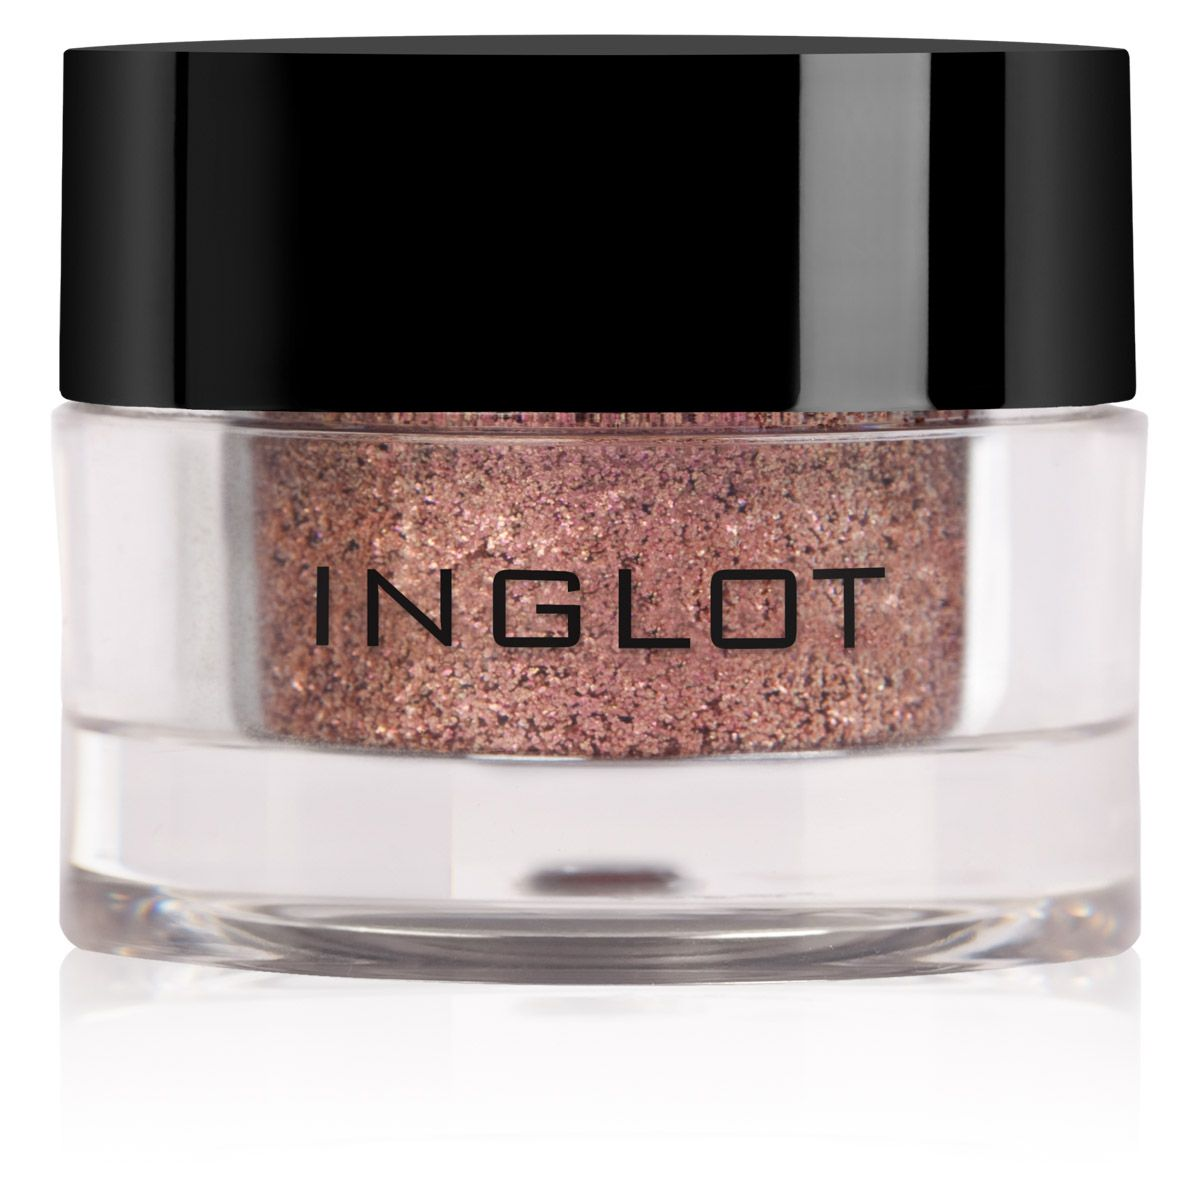 Inglot AMC Pure Pigment Eye Shadow - 119